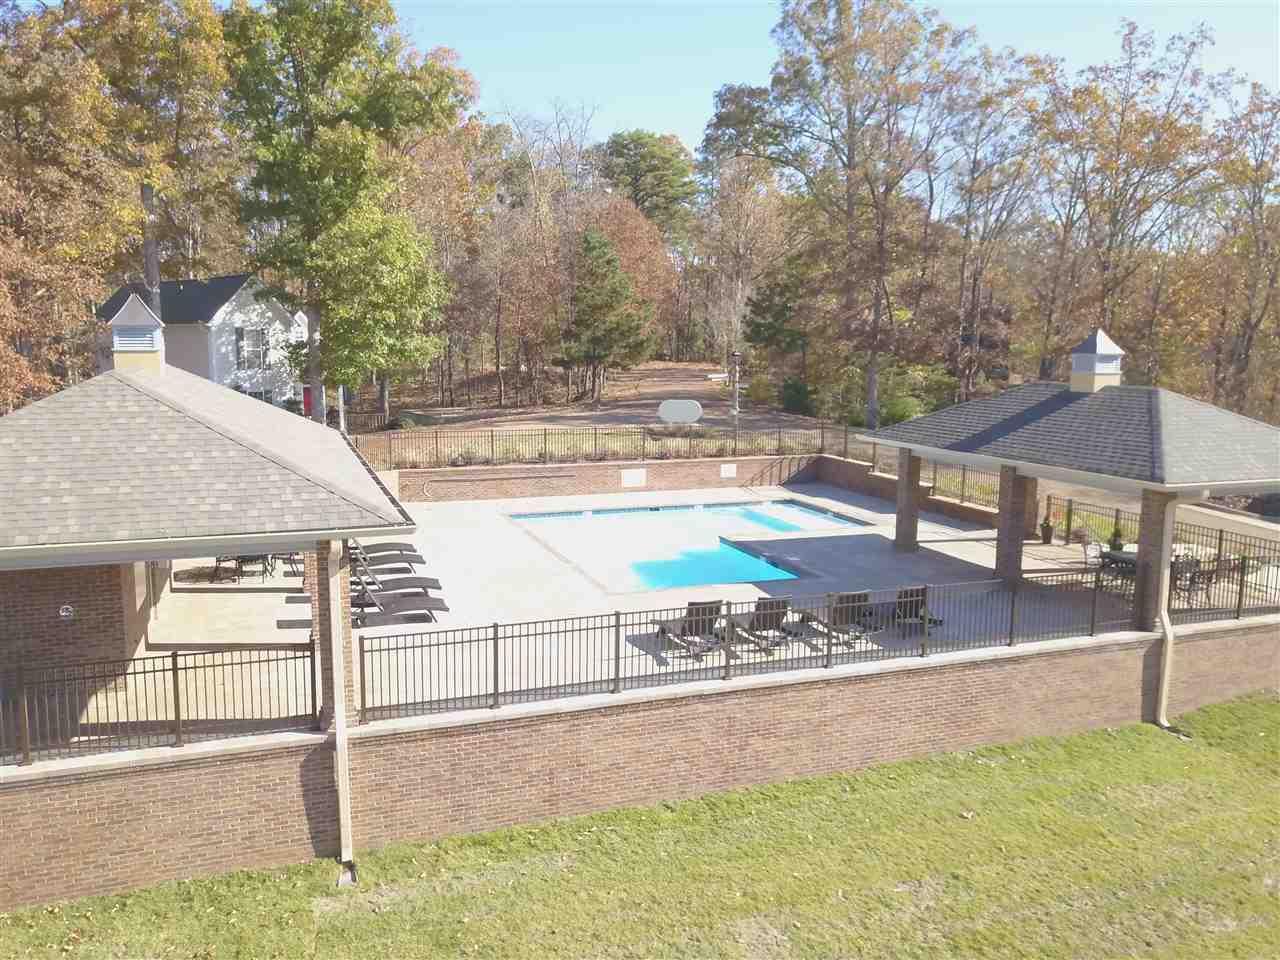 645 Anderson Hollow Savannah, TN 38372 - MLS #: 10020353